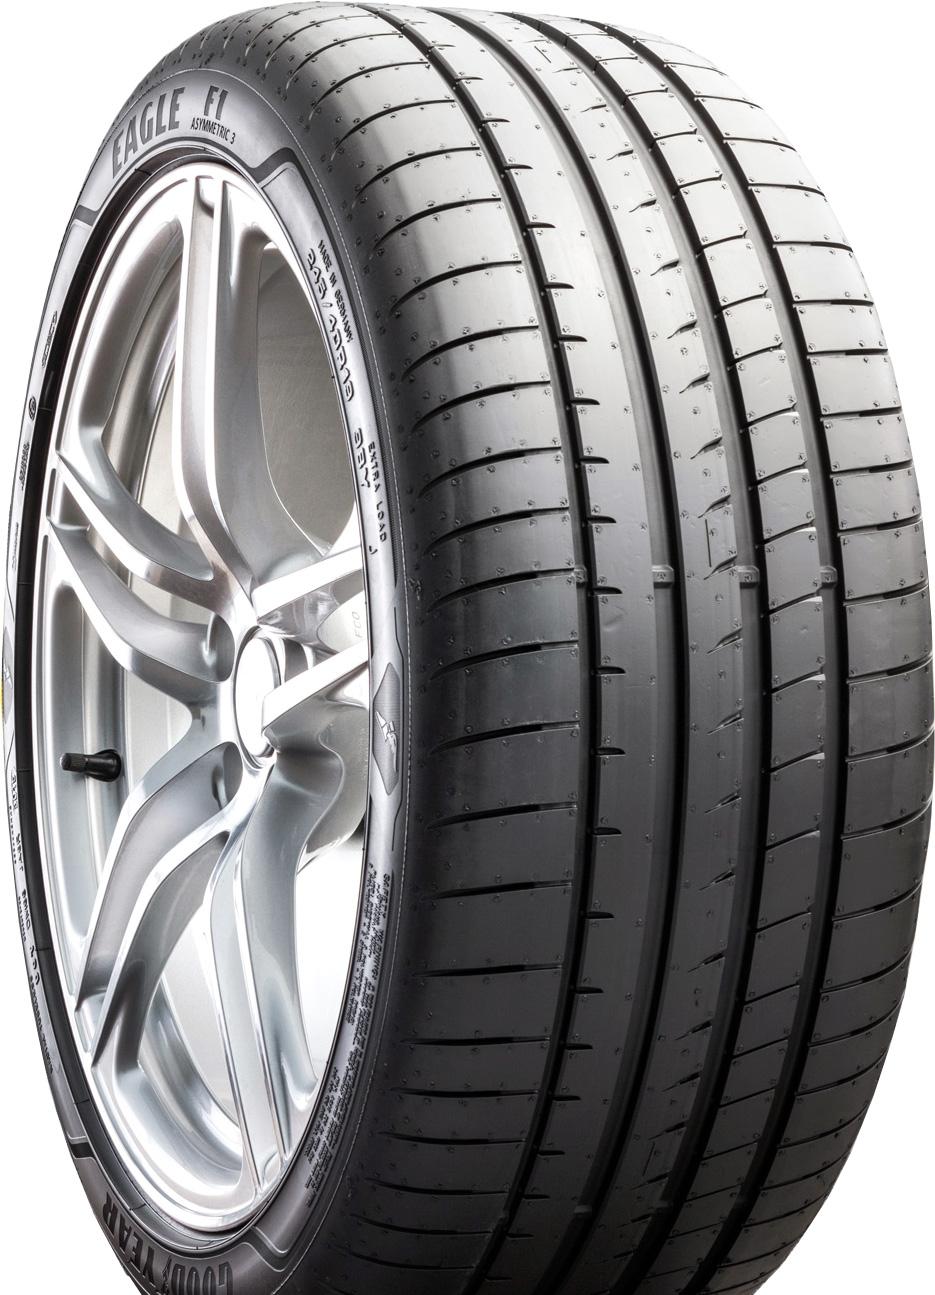 Автомобильные шины Goodyear Eagle F1 Asymmetric 3 SUV 265/45R20 104Y